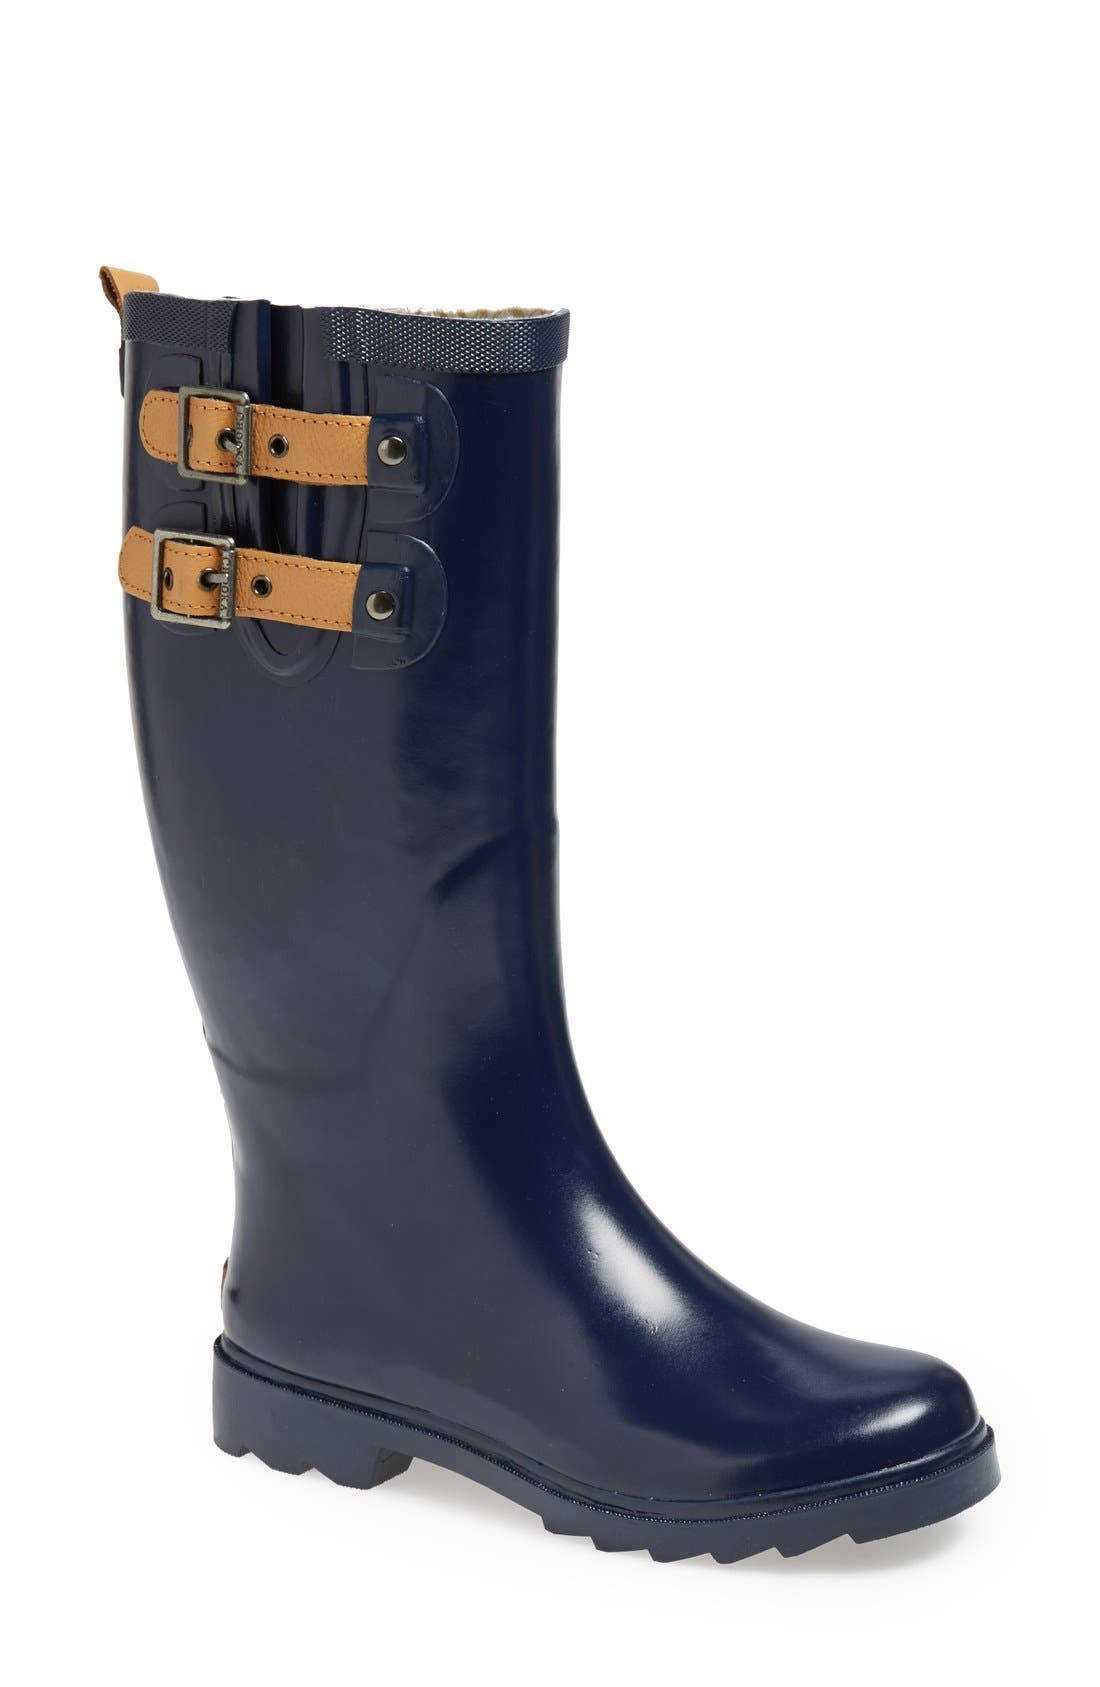 Alternate Image 1 Selected - Chooka 'Top Solid' Rain Boot (Women)